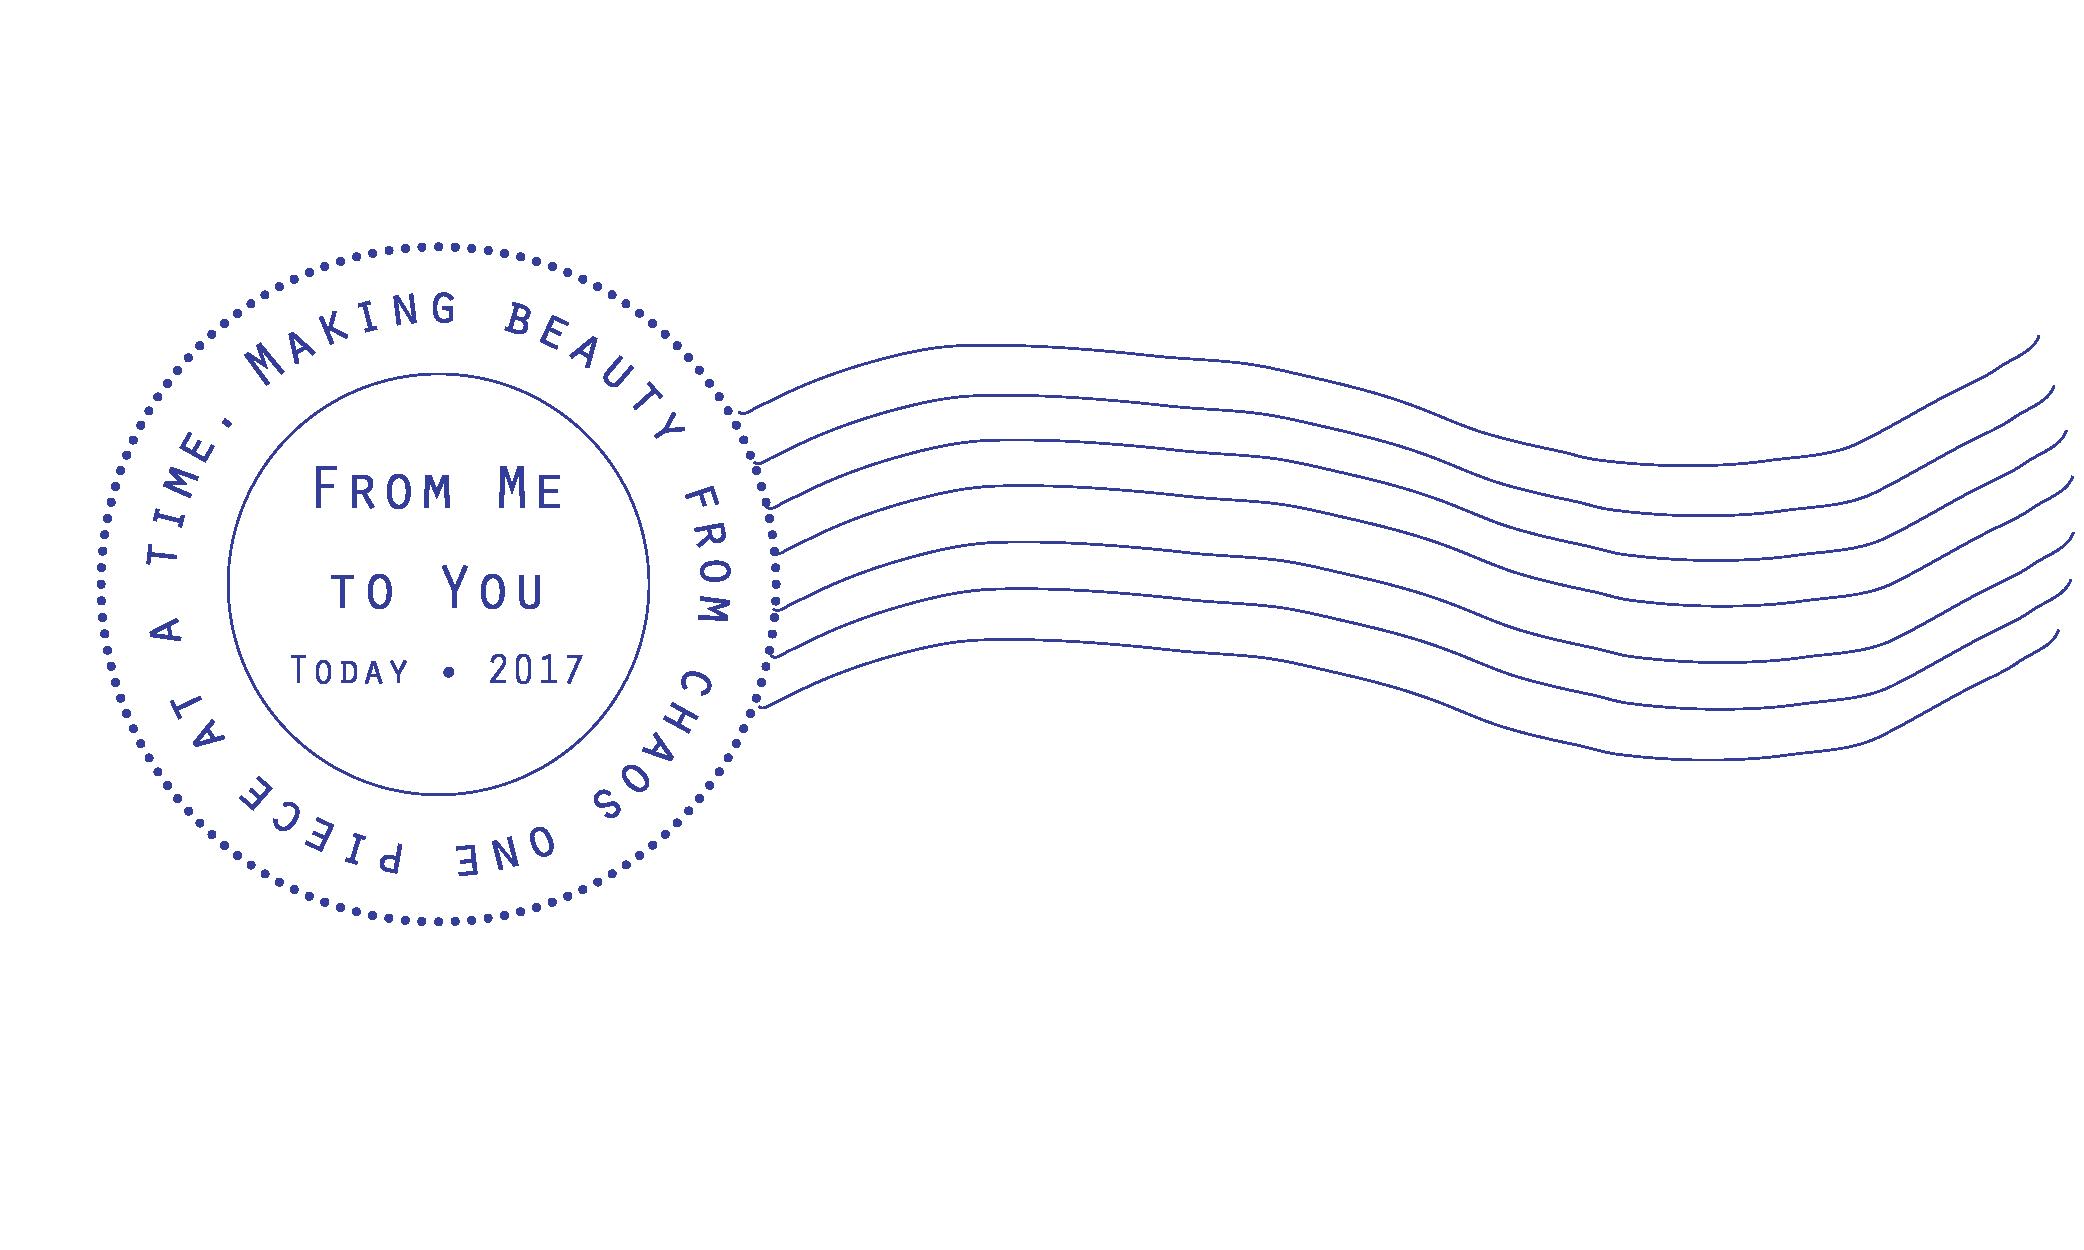 qm site postmark.png